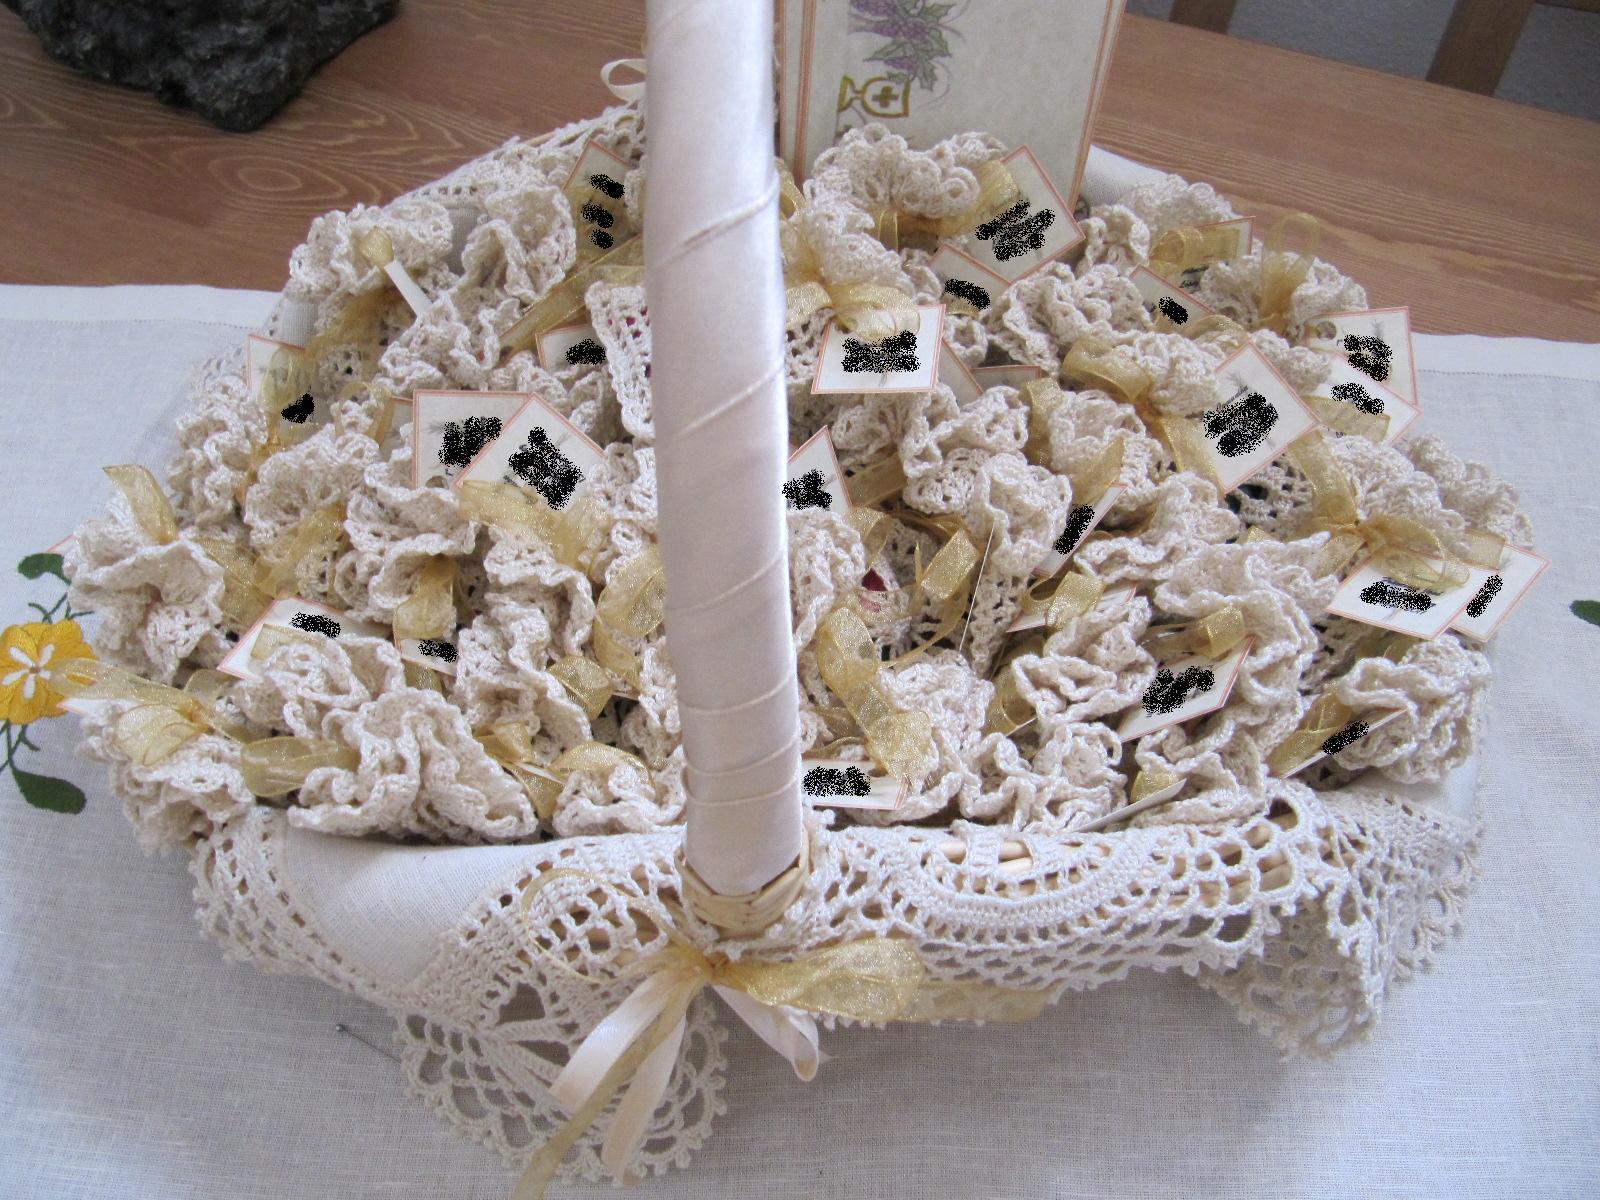 Labores de mari angeles bolsitas de ganchillo para regalo - Detalles de ganchillo para regalar ...